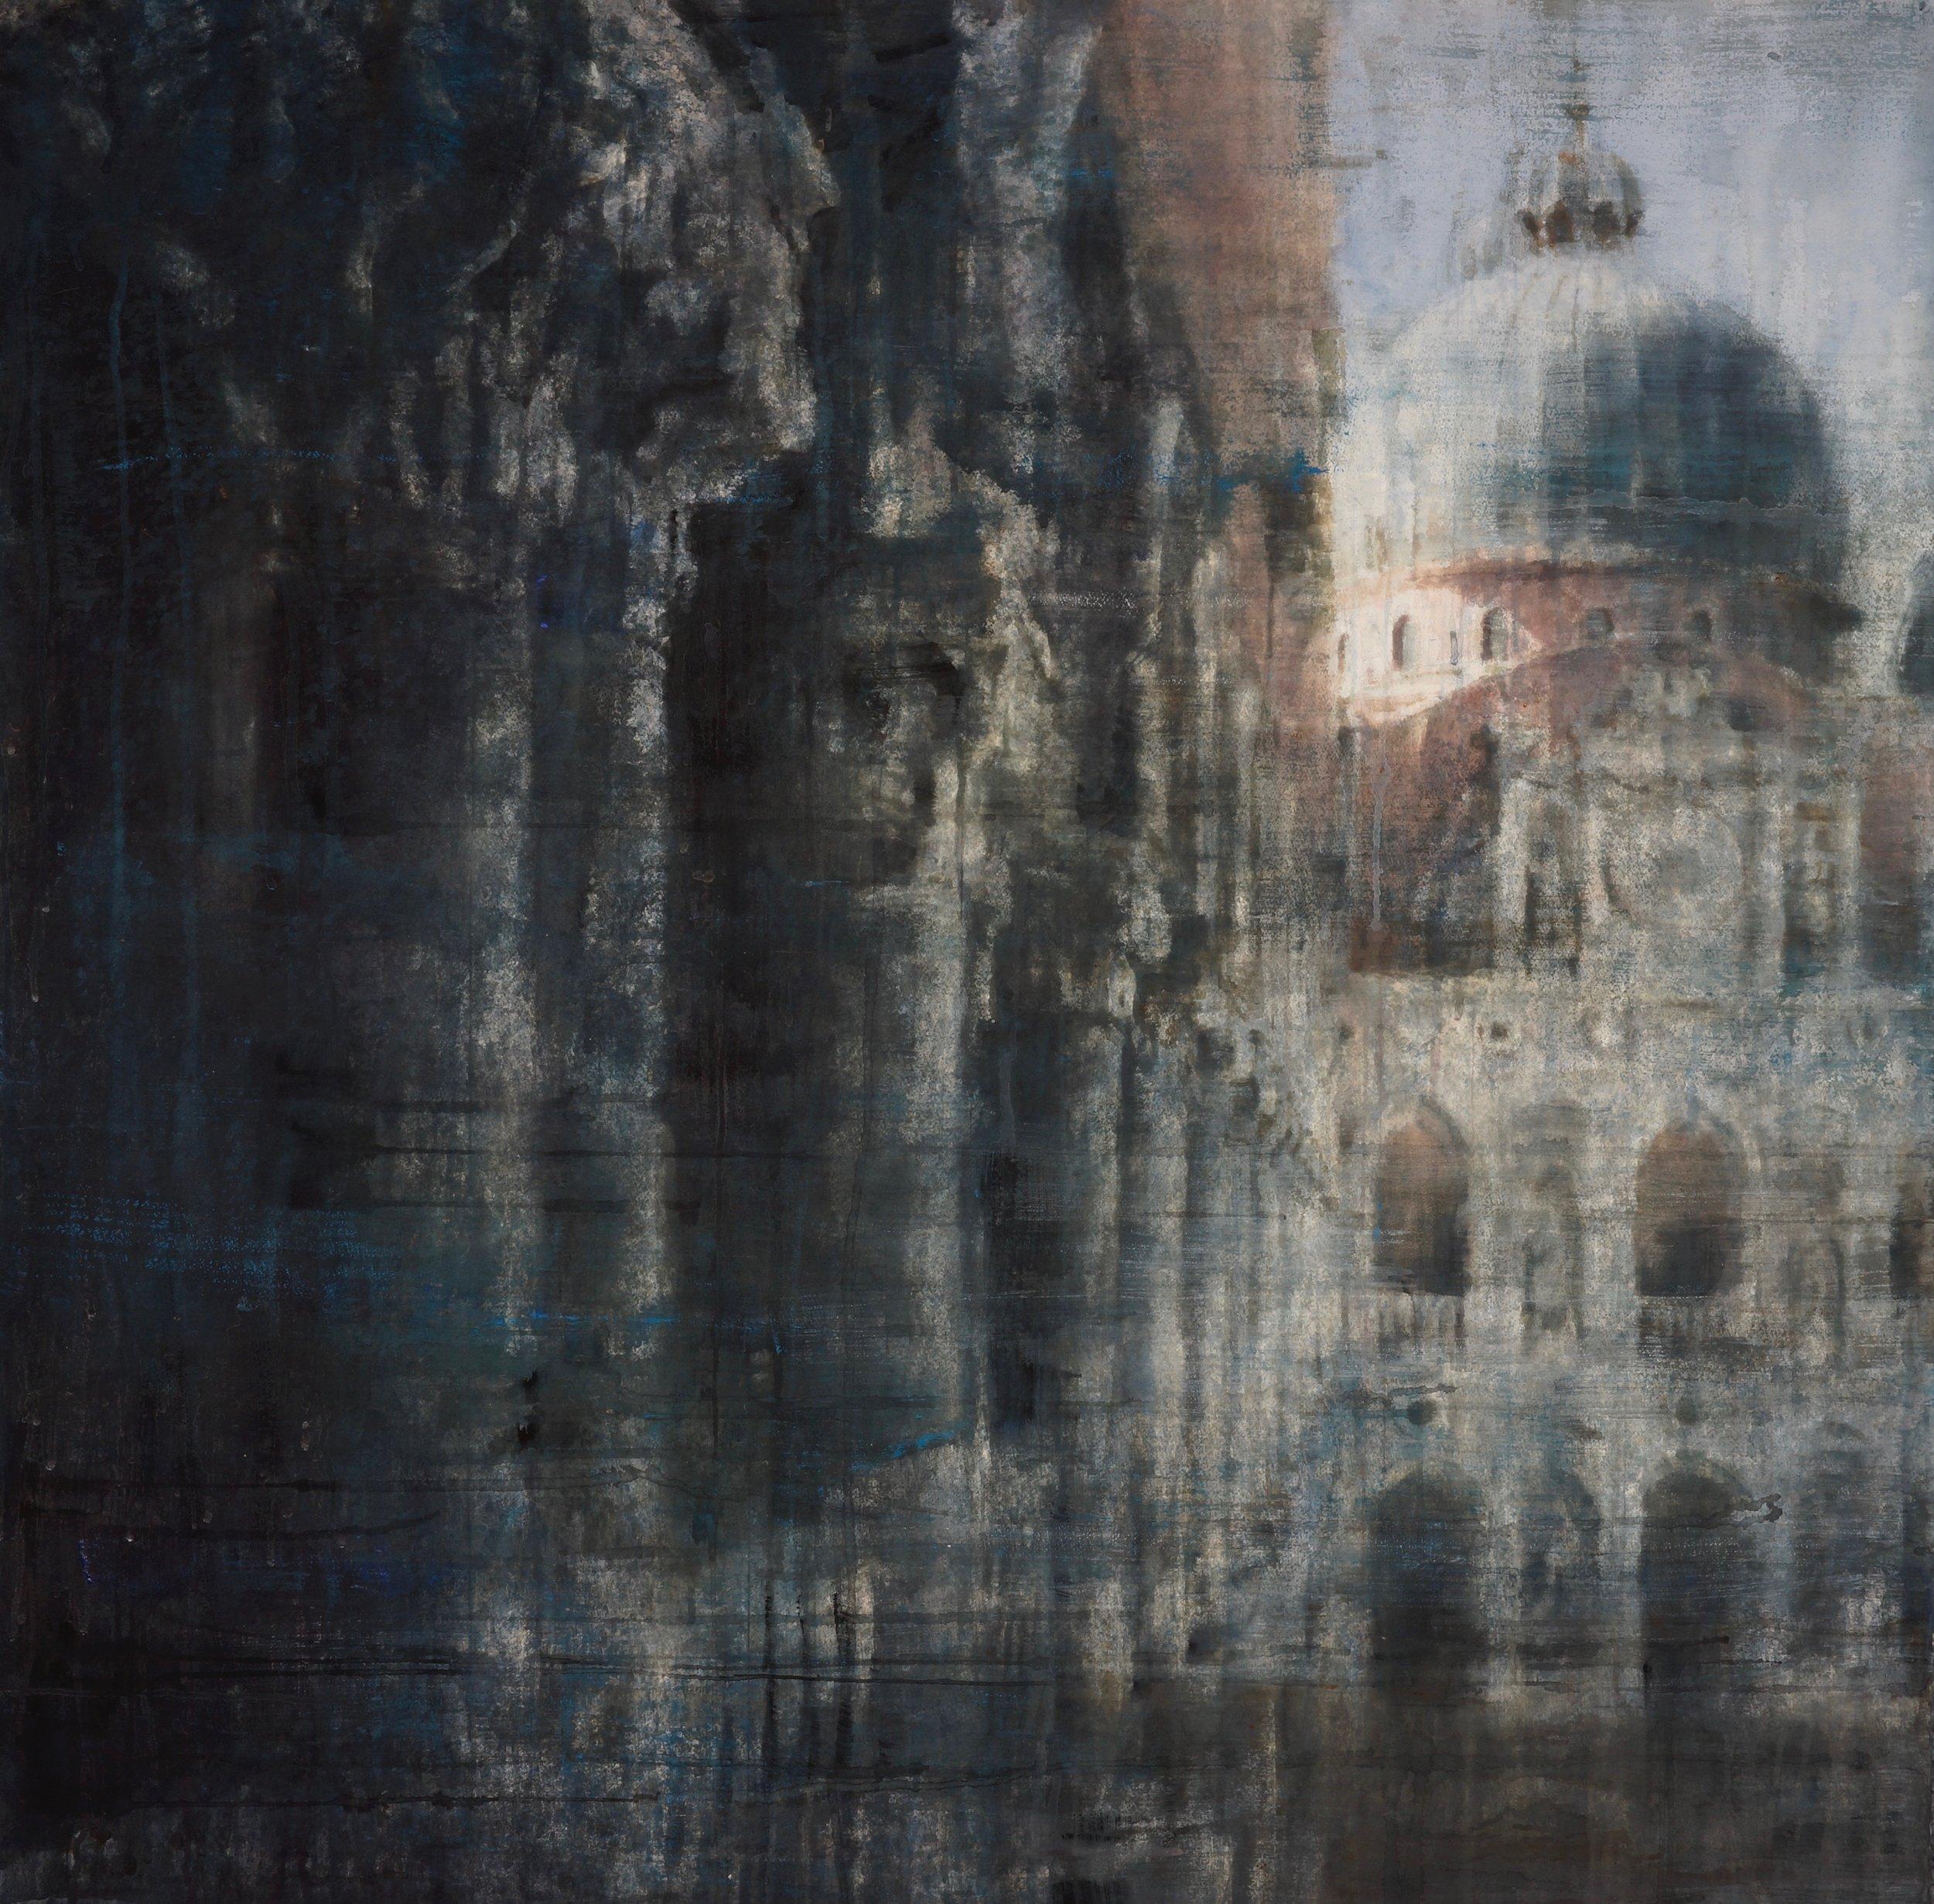 Venice IV, 2018